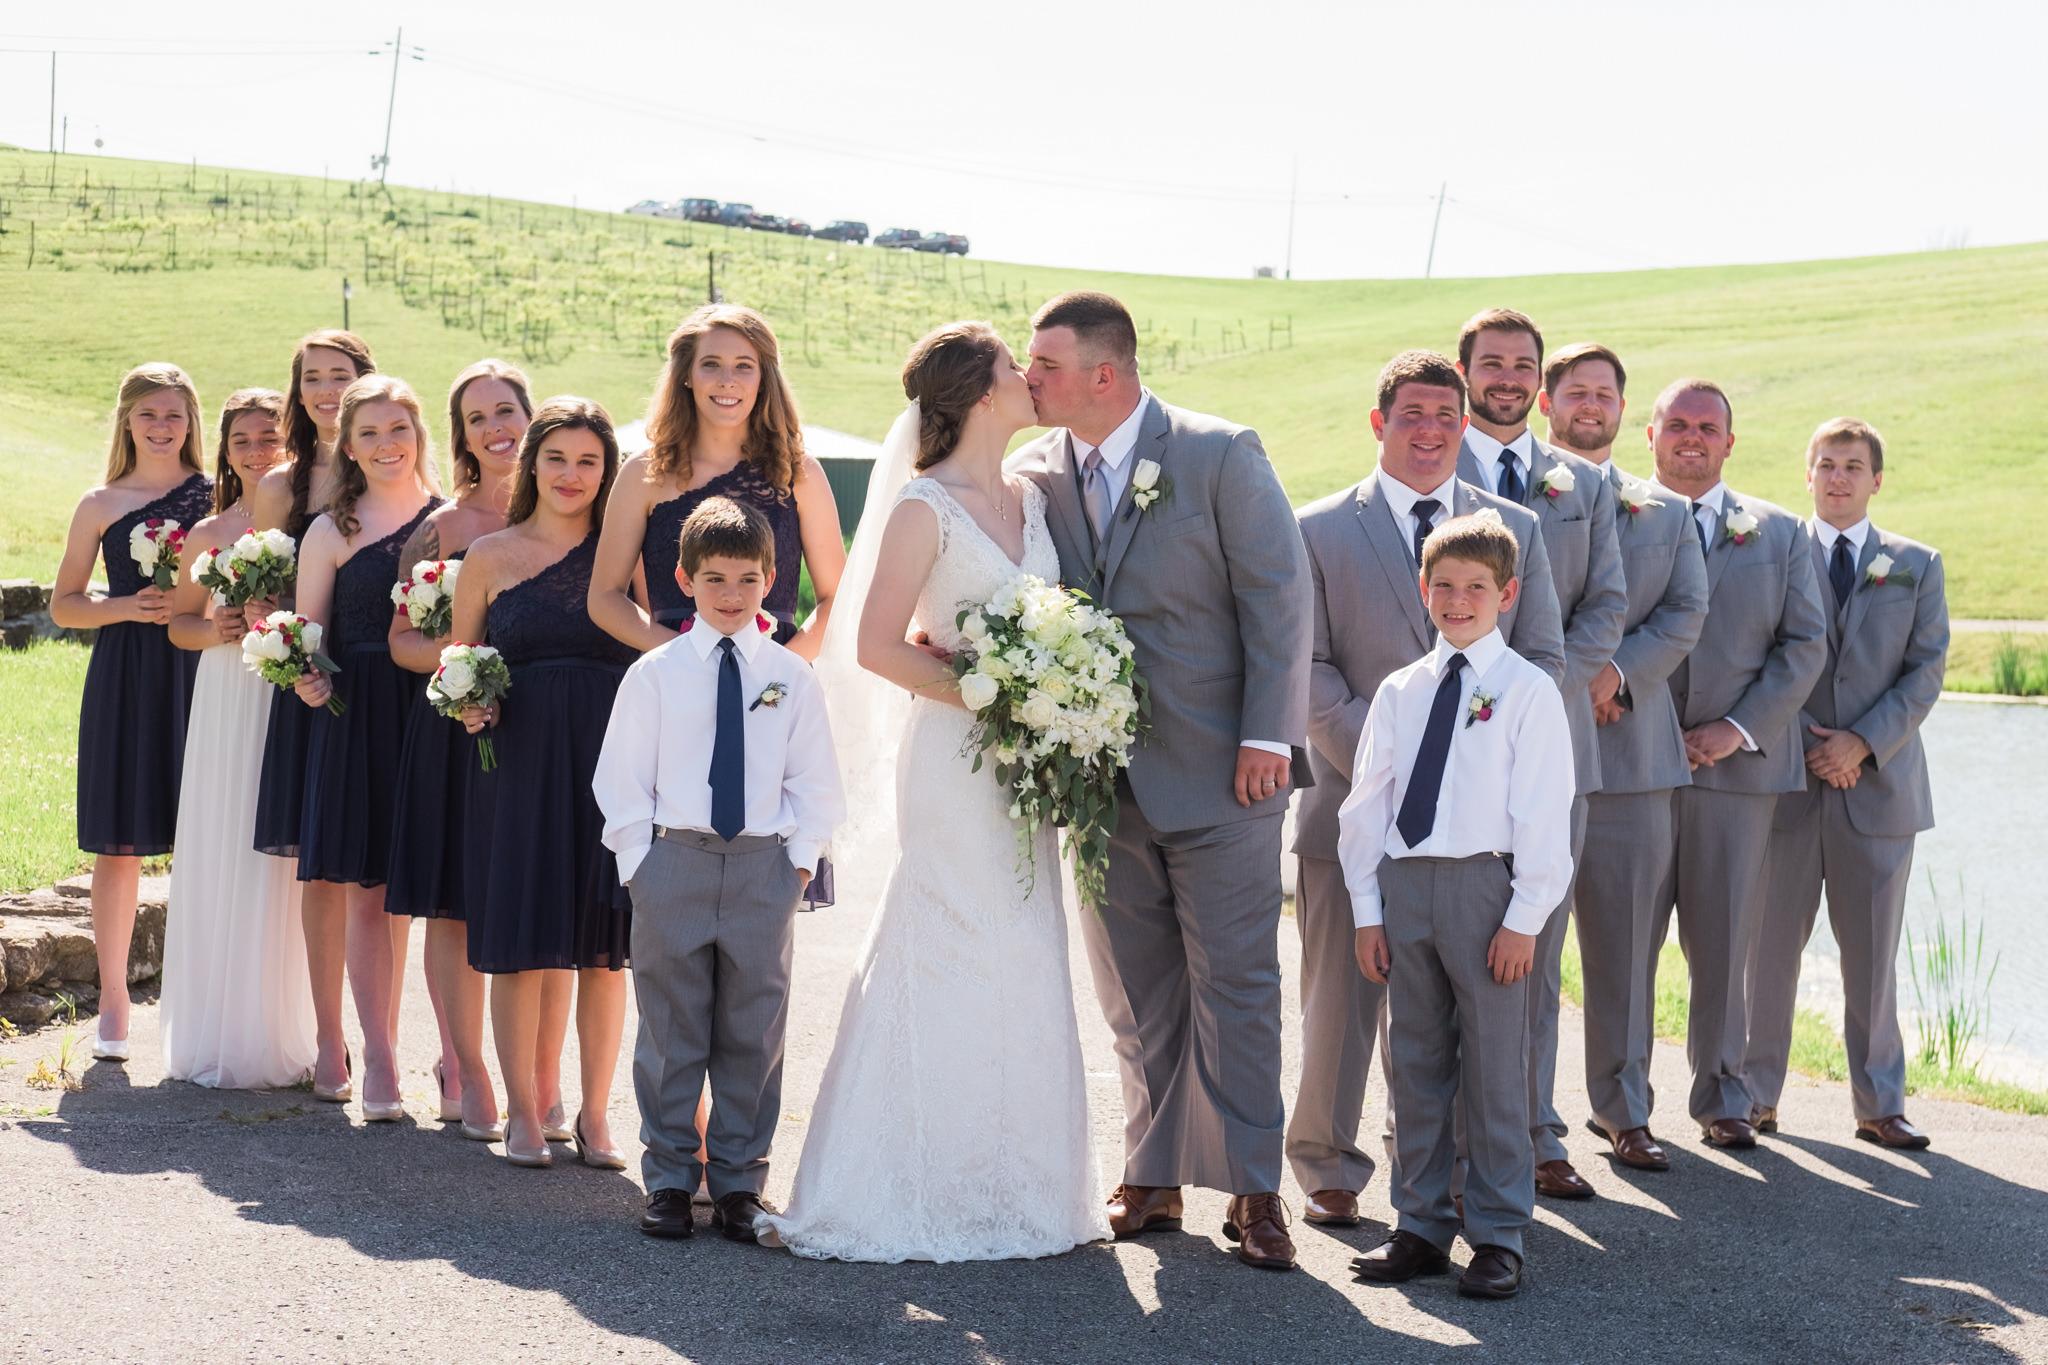 2017.06.03_Callie&Dustin_Wedding_Blog_0031.jpg